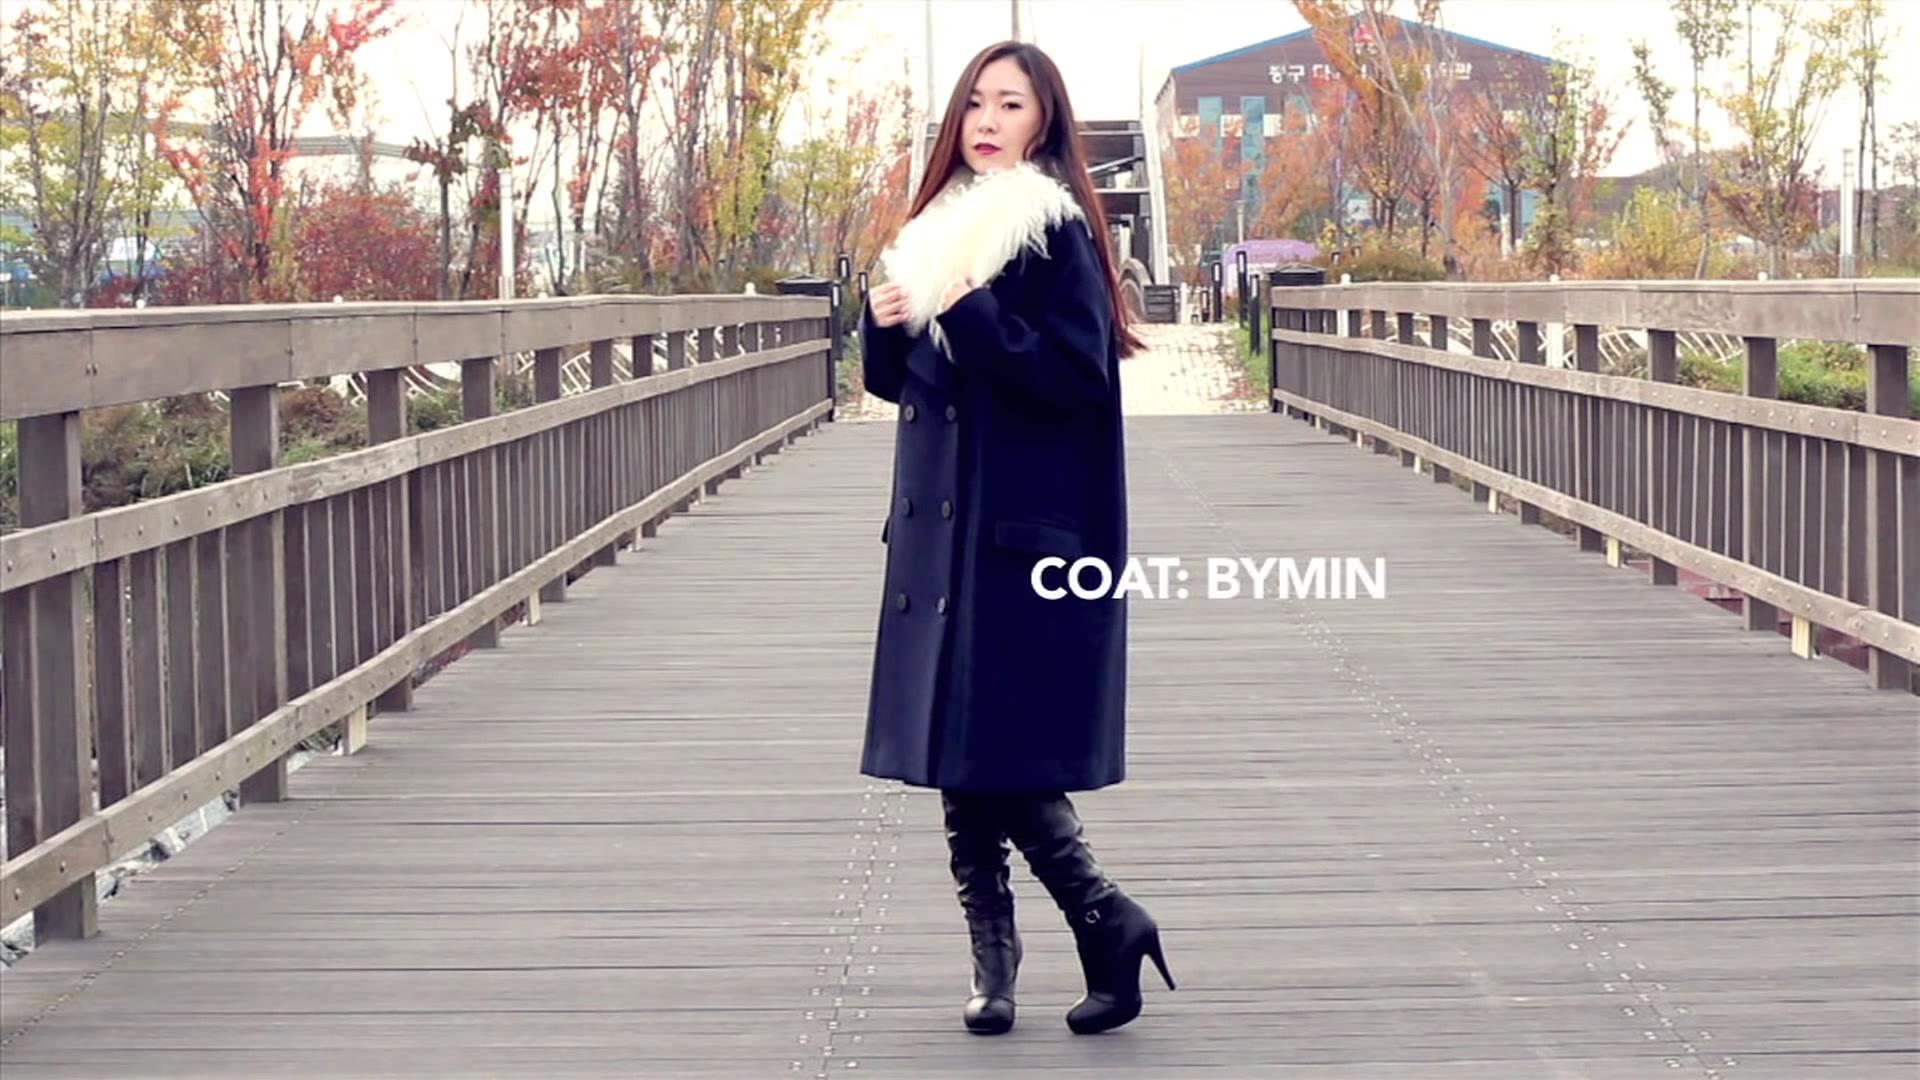 itsjinakim Episode 55: Fall to Winter Lookbook 1: Modern & Classic